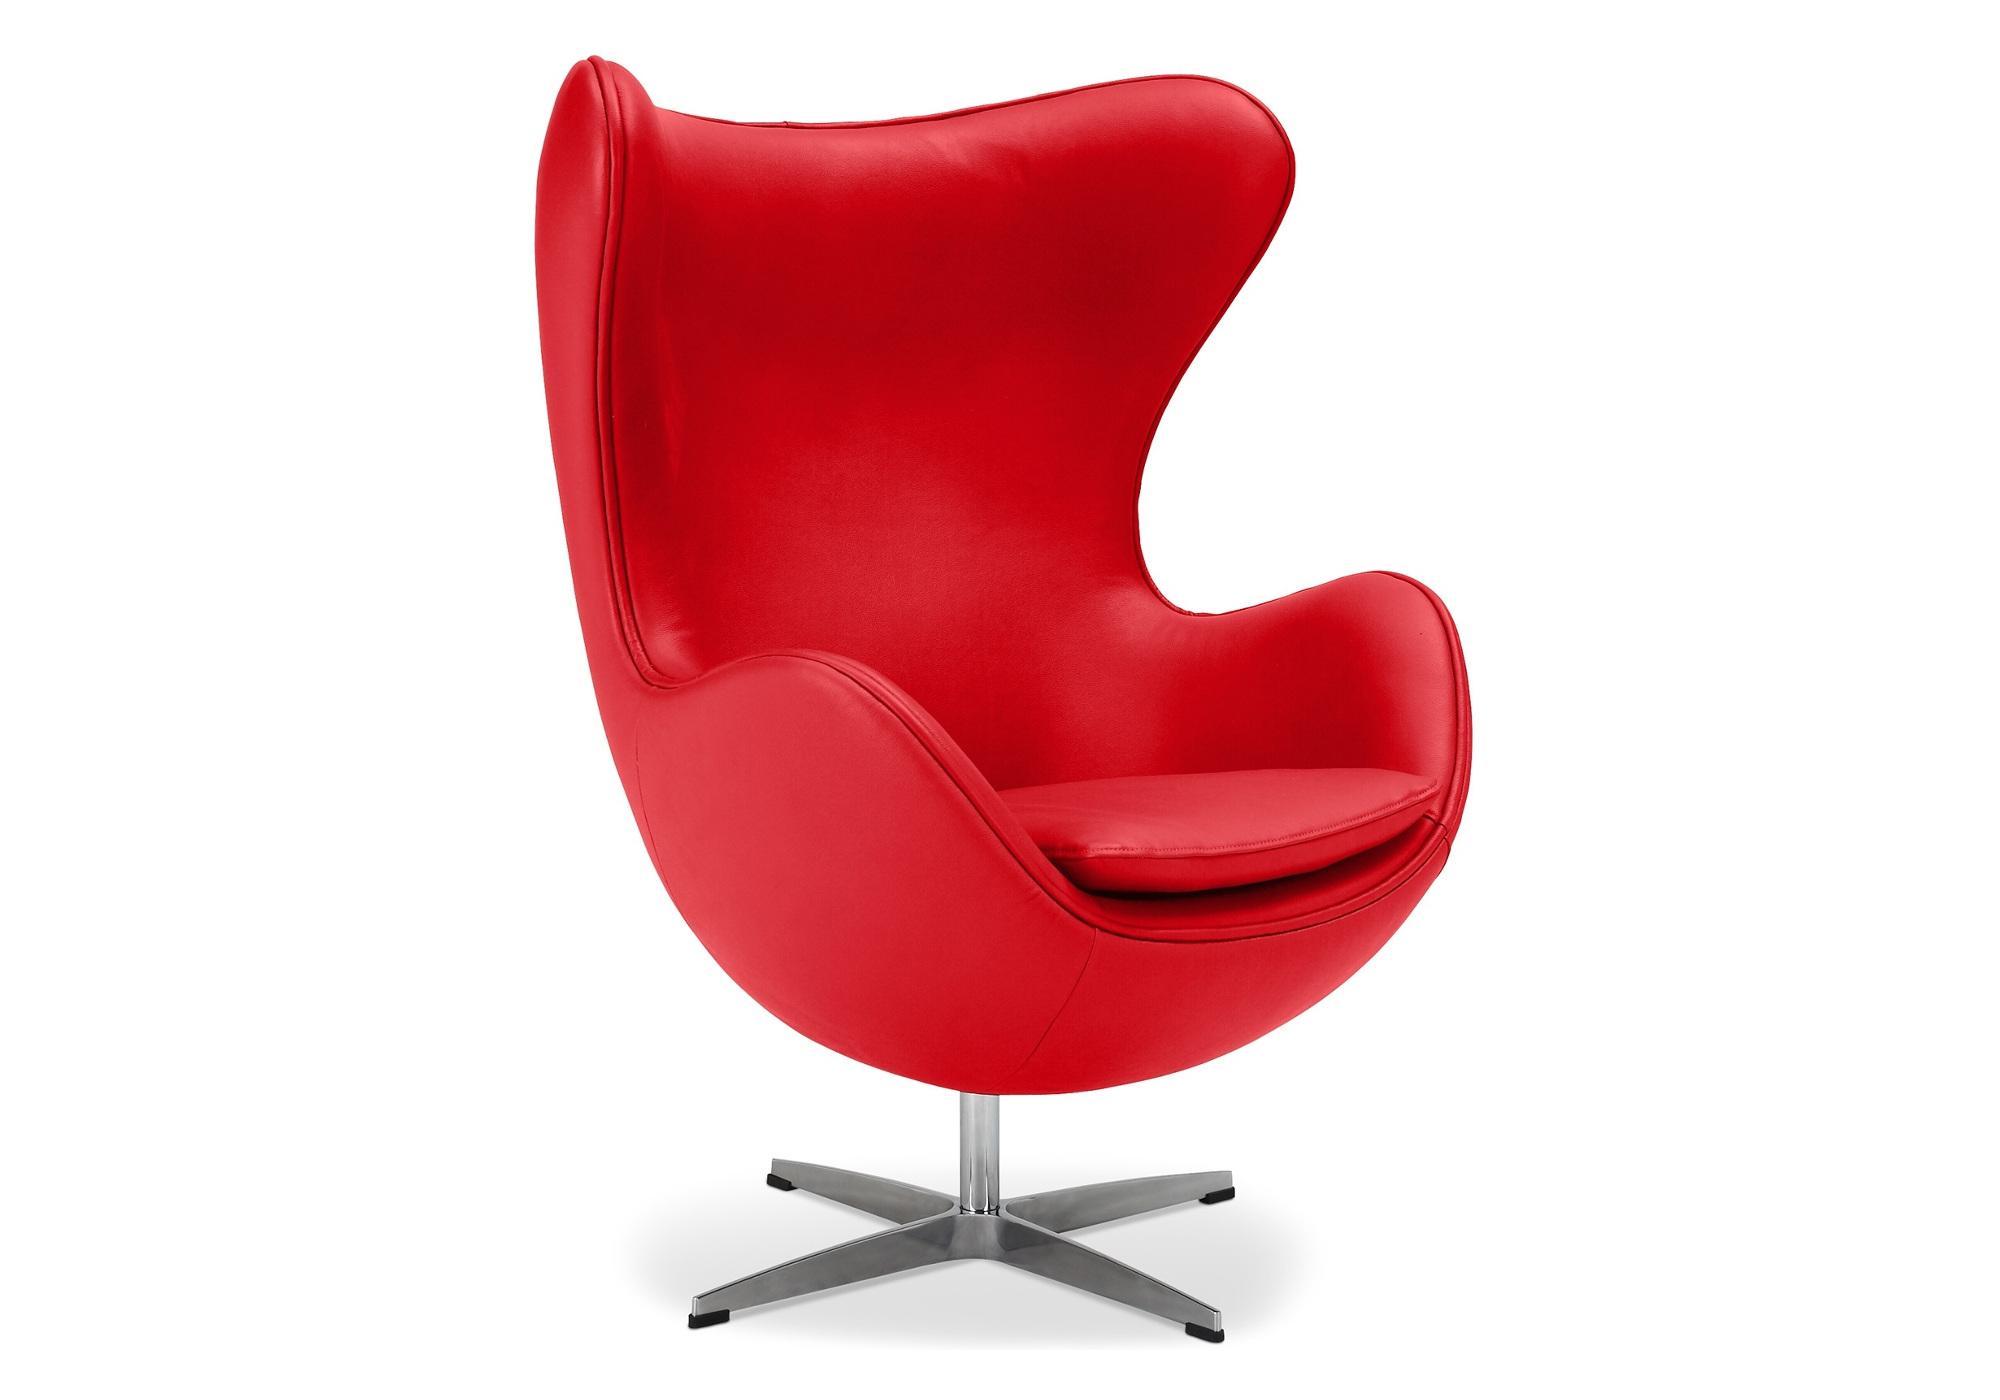 Fauteuil design oeuf rouge EGGO